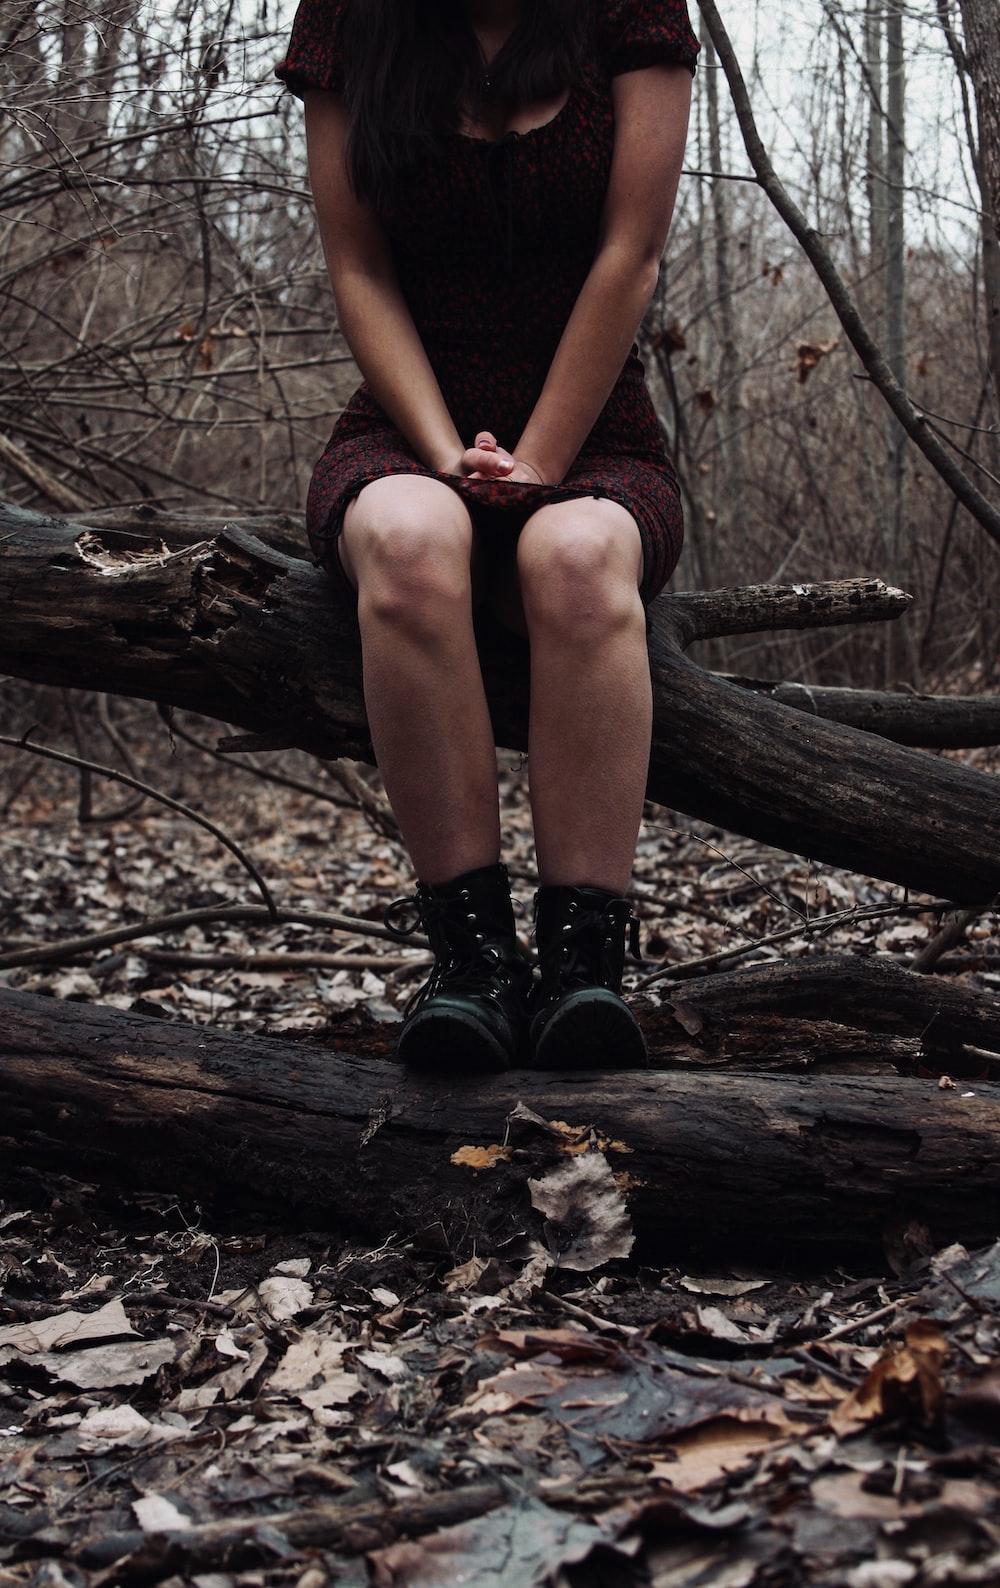 woman in black stockings sitting on brown tree log